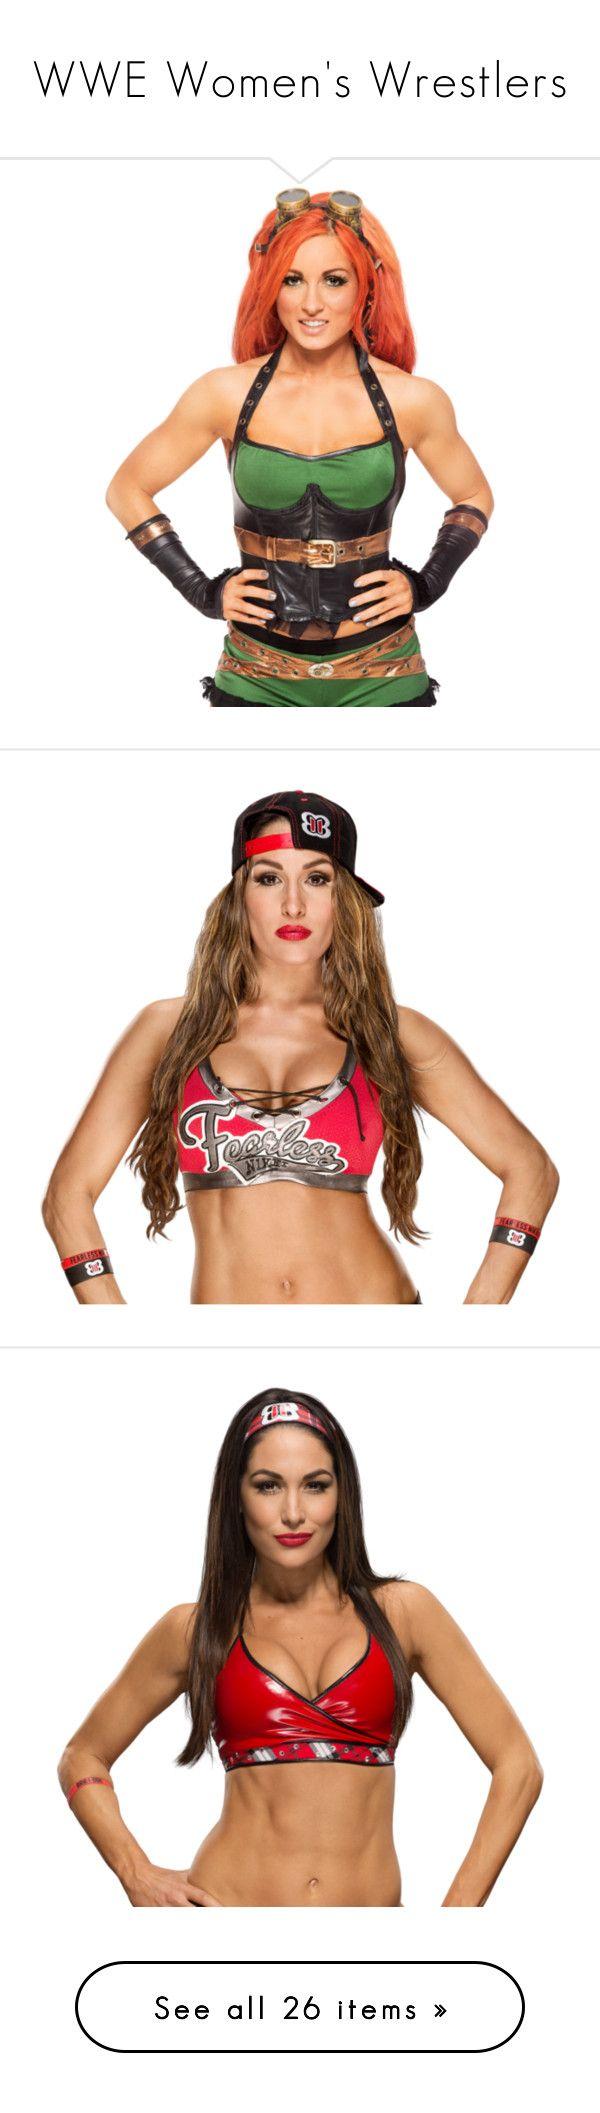 """WWE Women's Wrestlers"" by wwegirl2424 ❤ liked on Polyvore featuring becky lynch, wwe, emma, sasha banks, paige, carmella, natalya, alexa bliss, bayley and charlotte"